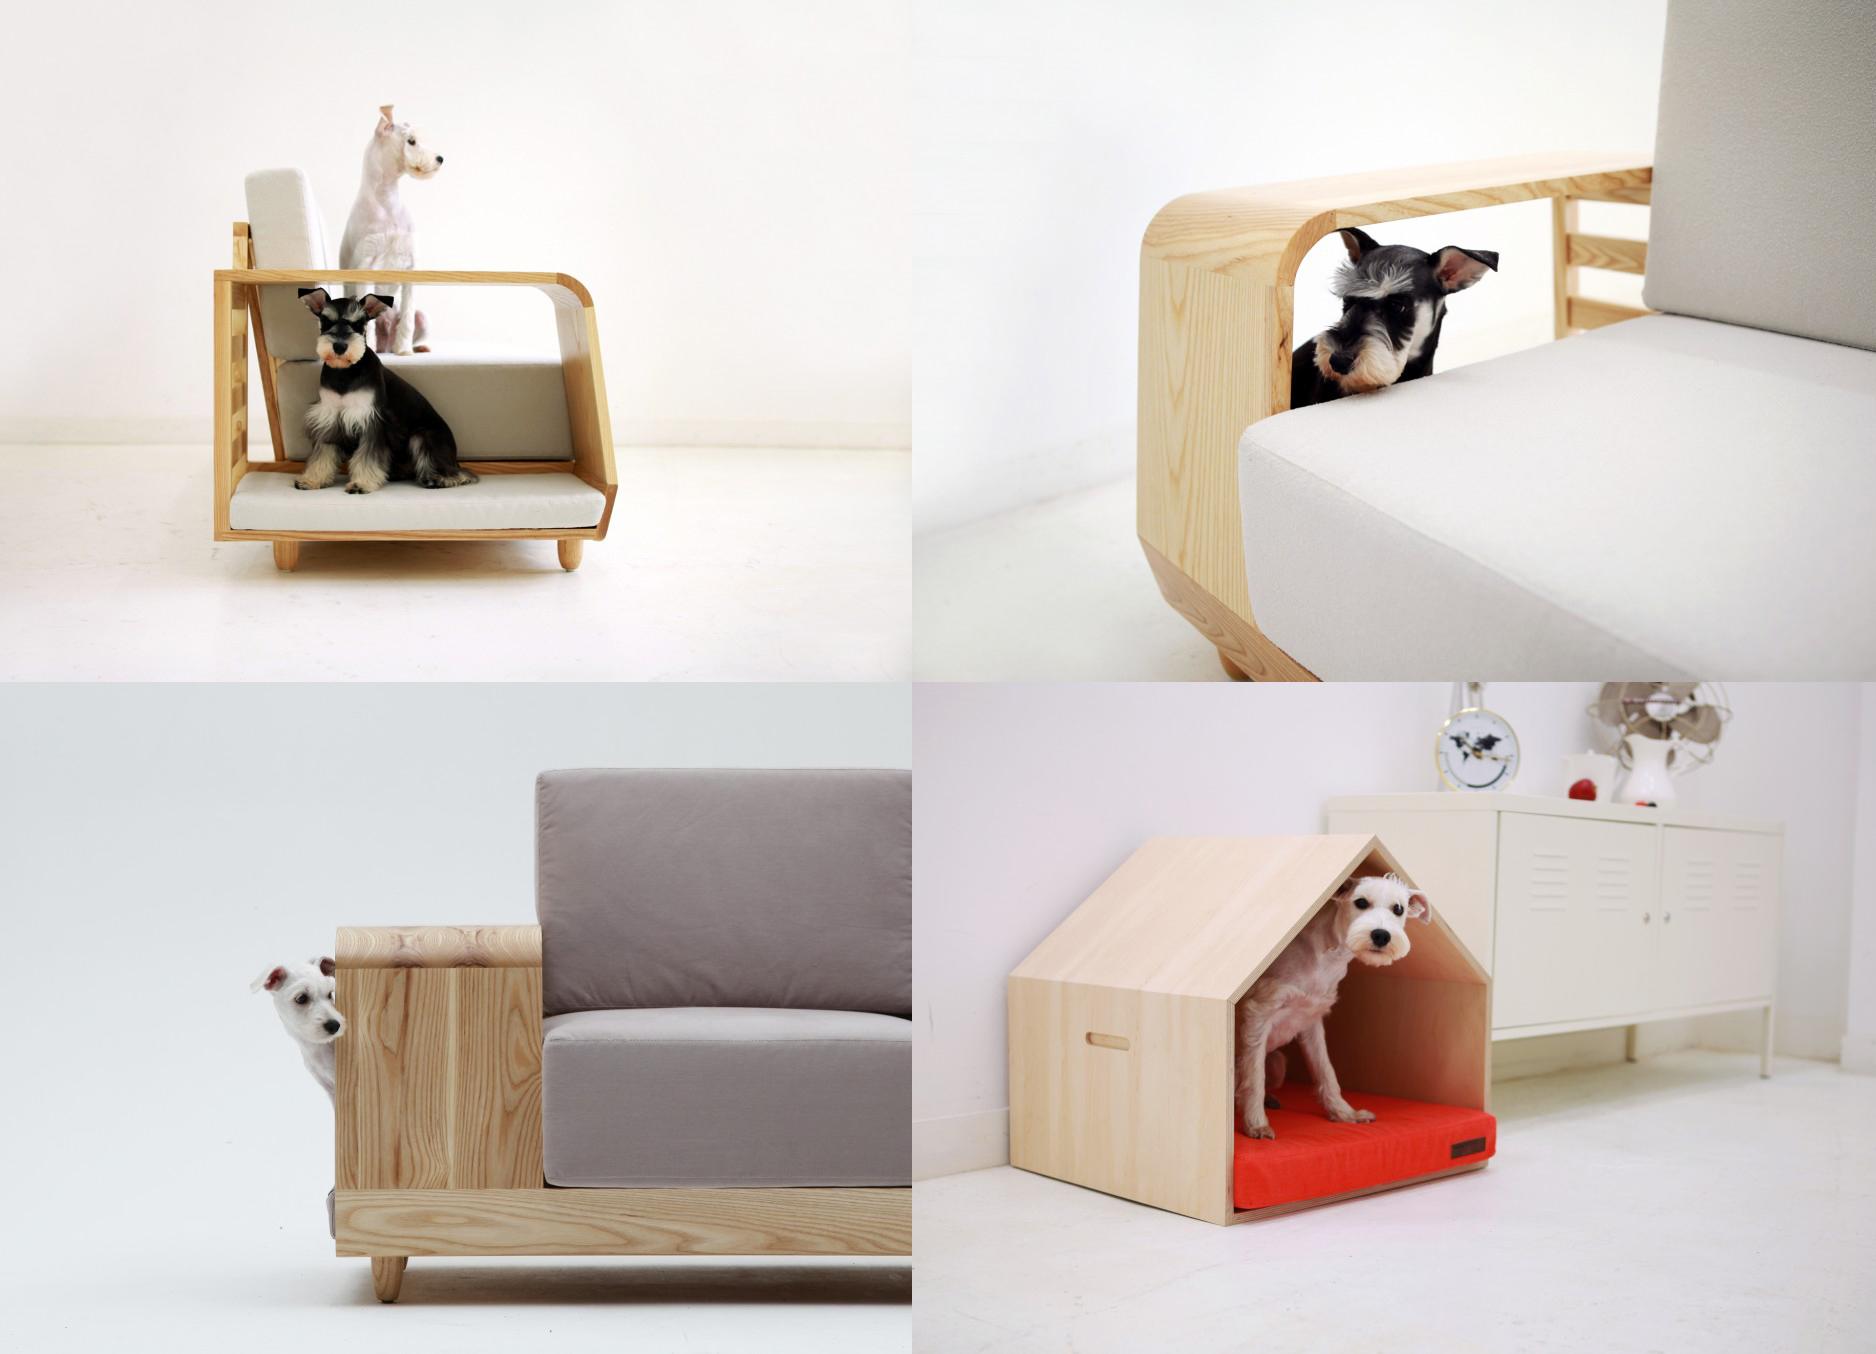 diseño de interior adaptado a tu mascota q